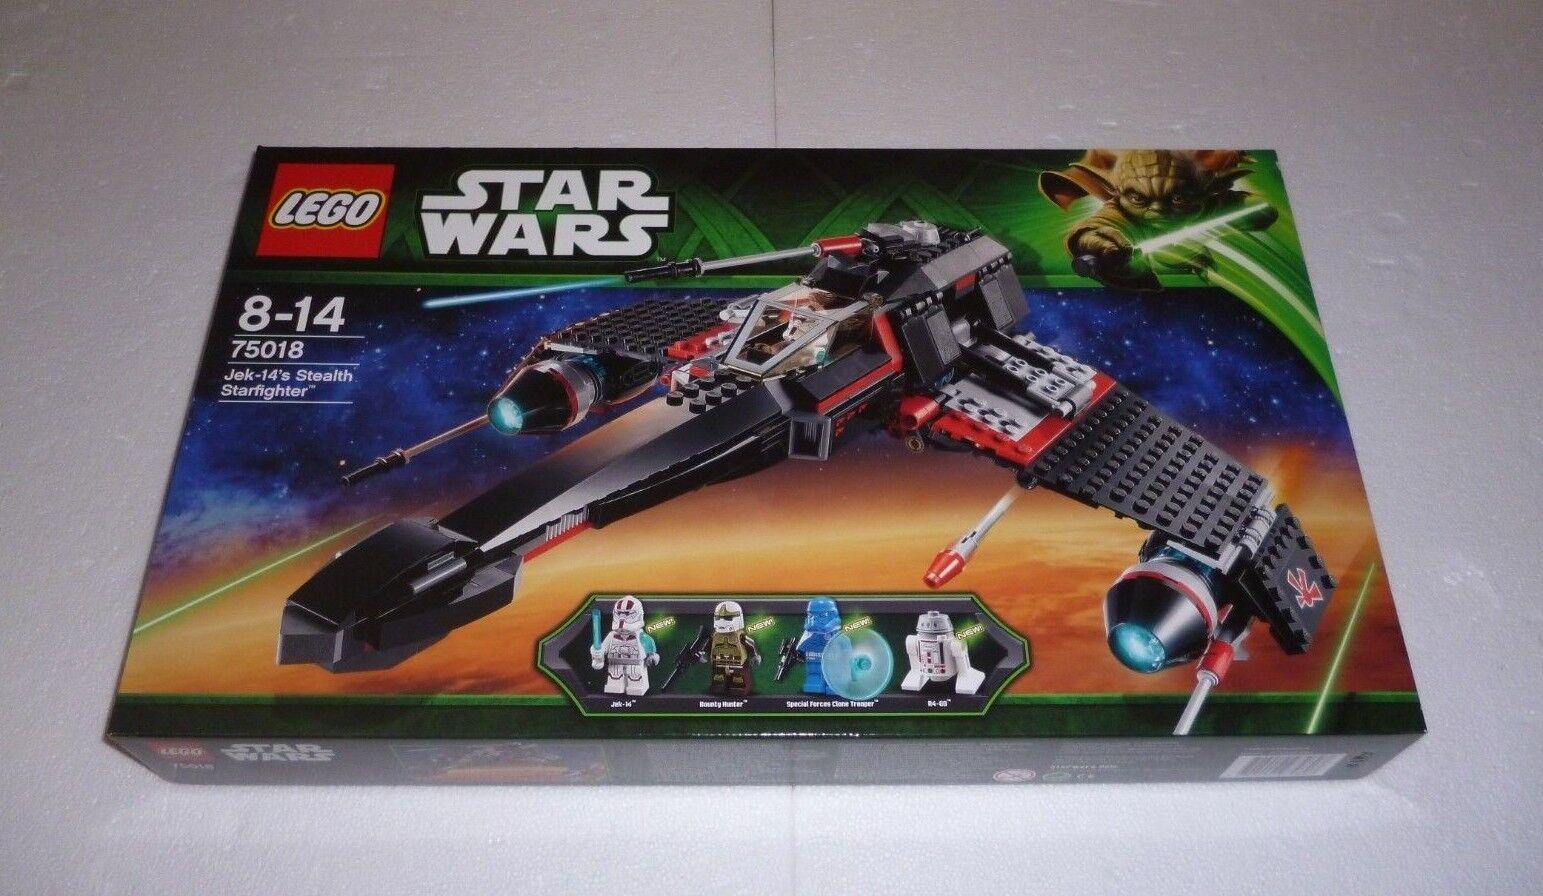 Jek Star Wars 14's Stealth Sa Starfighter75018Neuf NewDans 54RL3Ajq